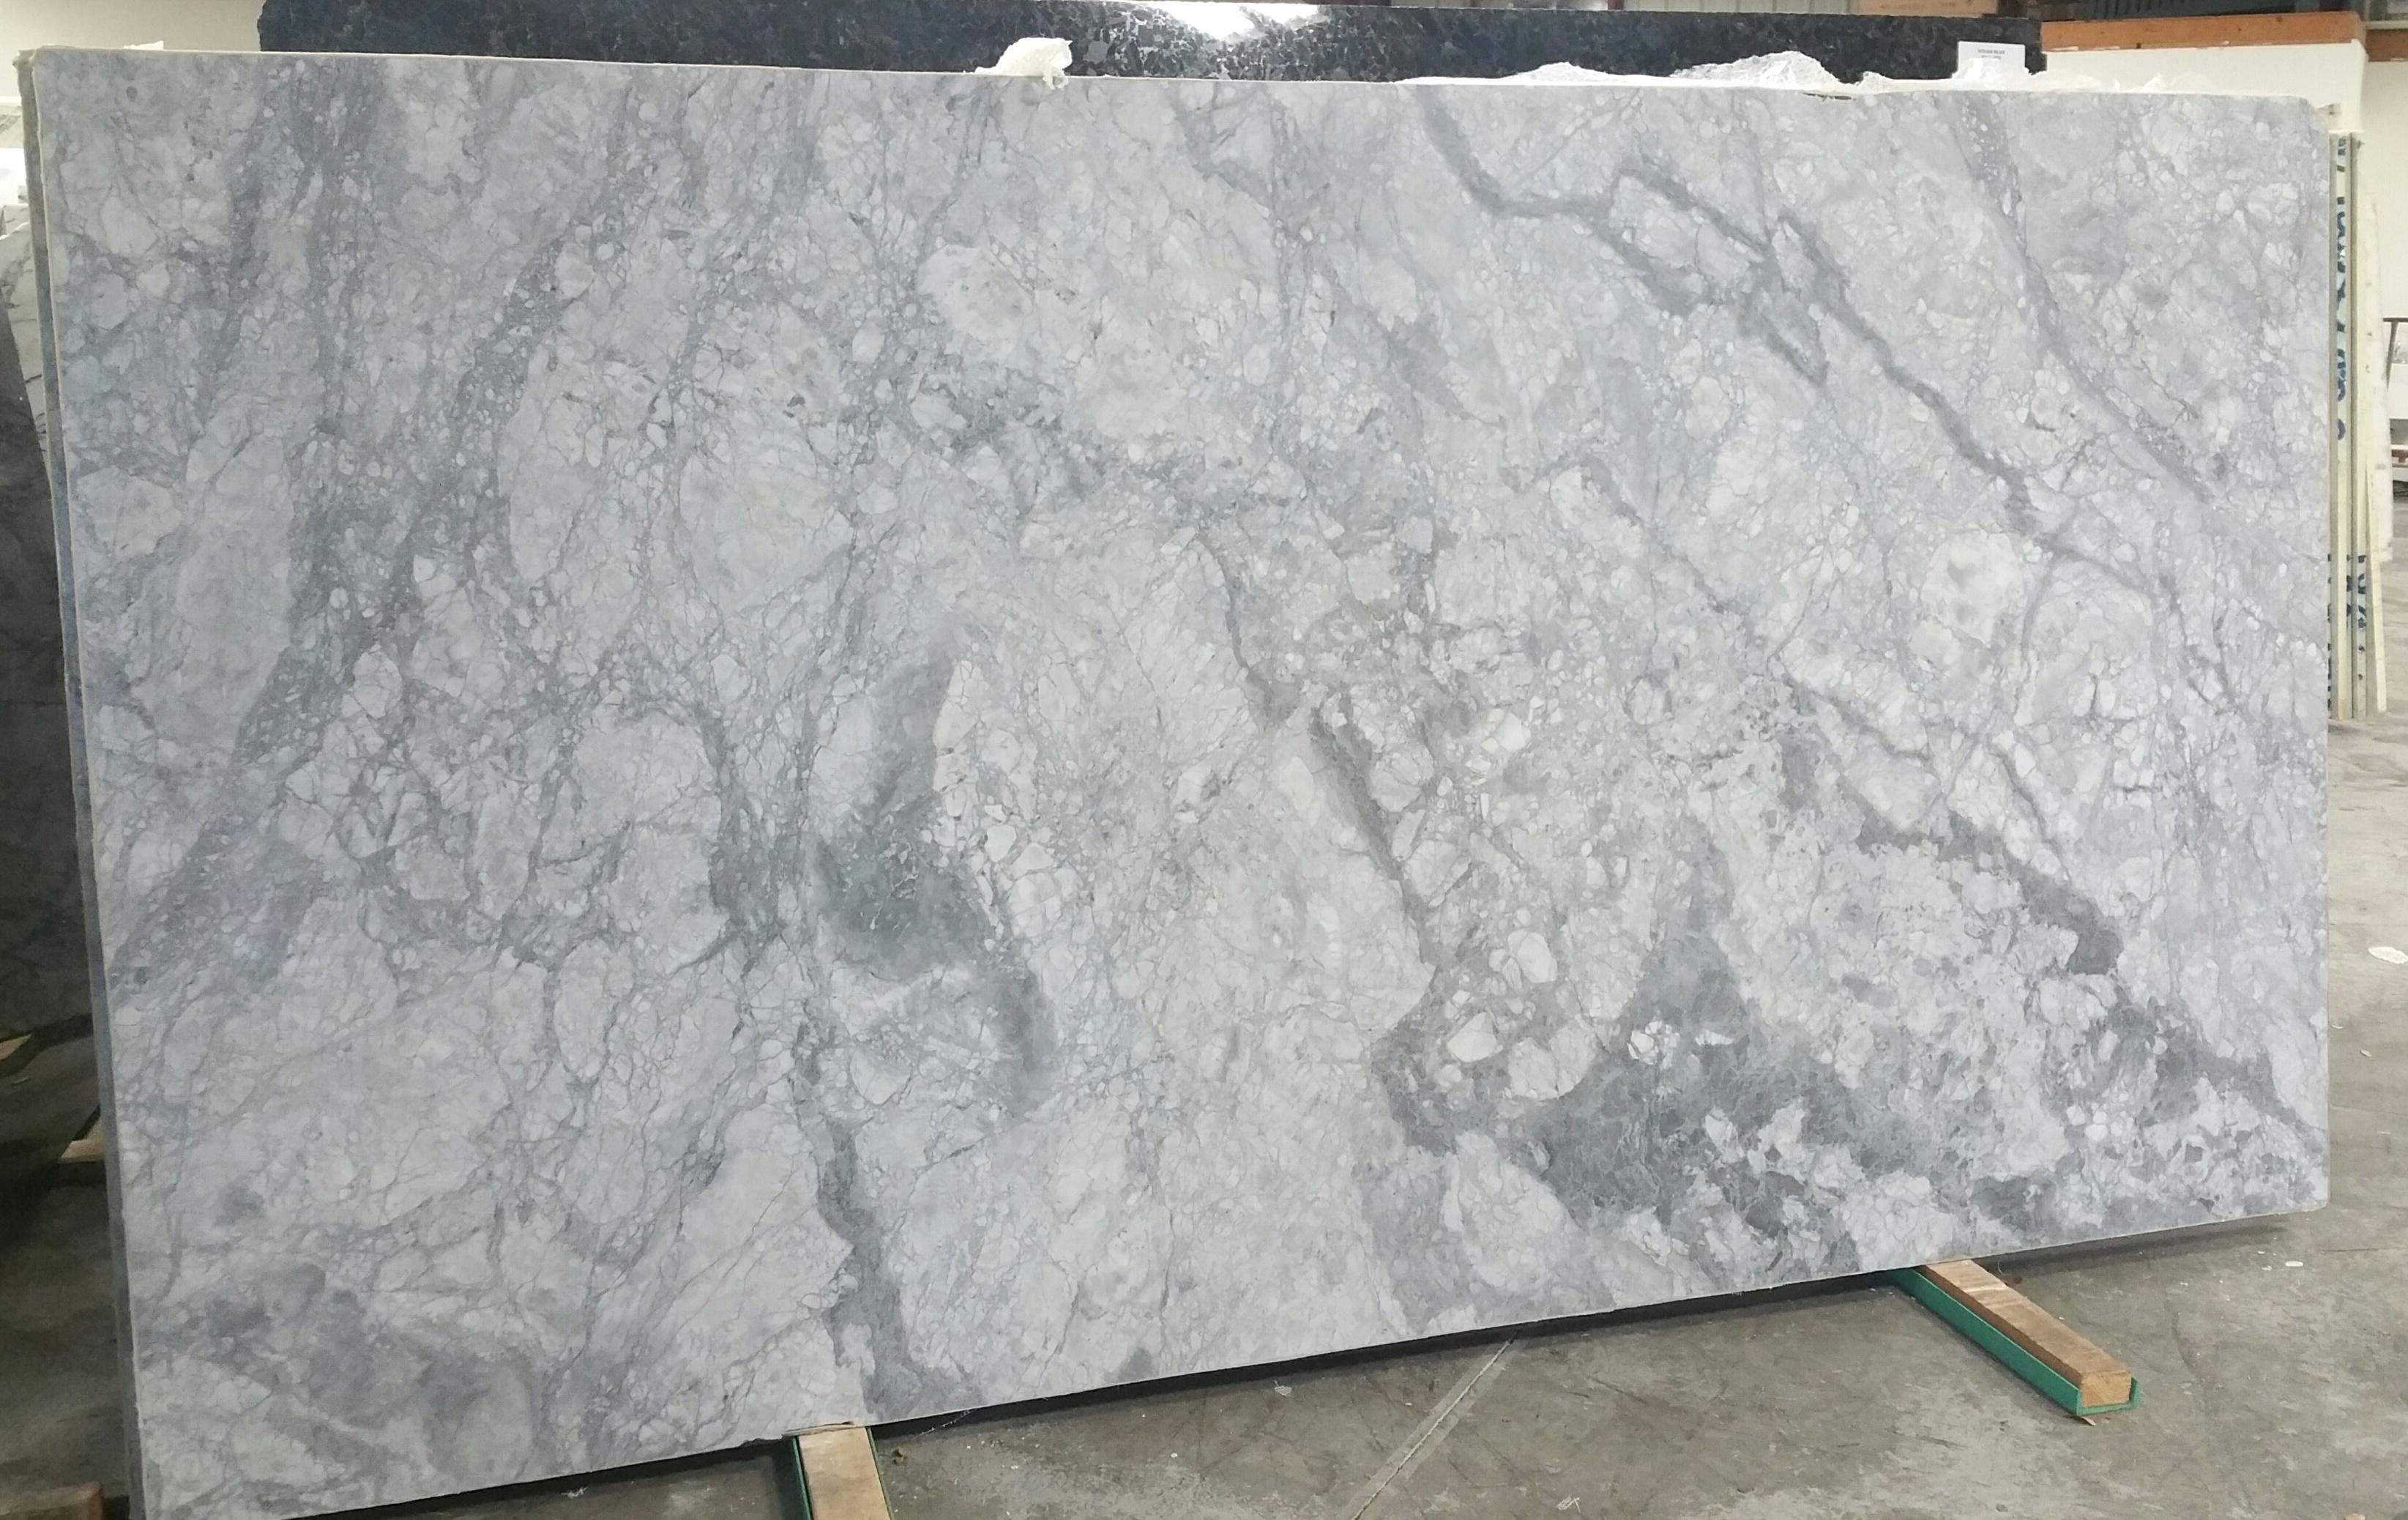 Especial Super Quartzite Supplier Lake Fl Arc Stone Tile On Rocks Story Super Marble Vs Granite Counters Cost Marble Vs Granite Hardness On Rocks Story houzz 01 Marble Vs Granite